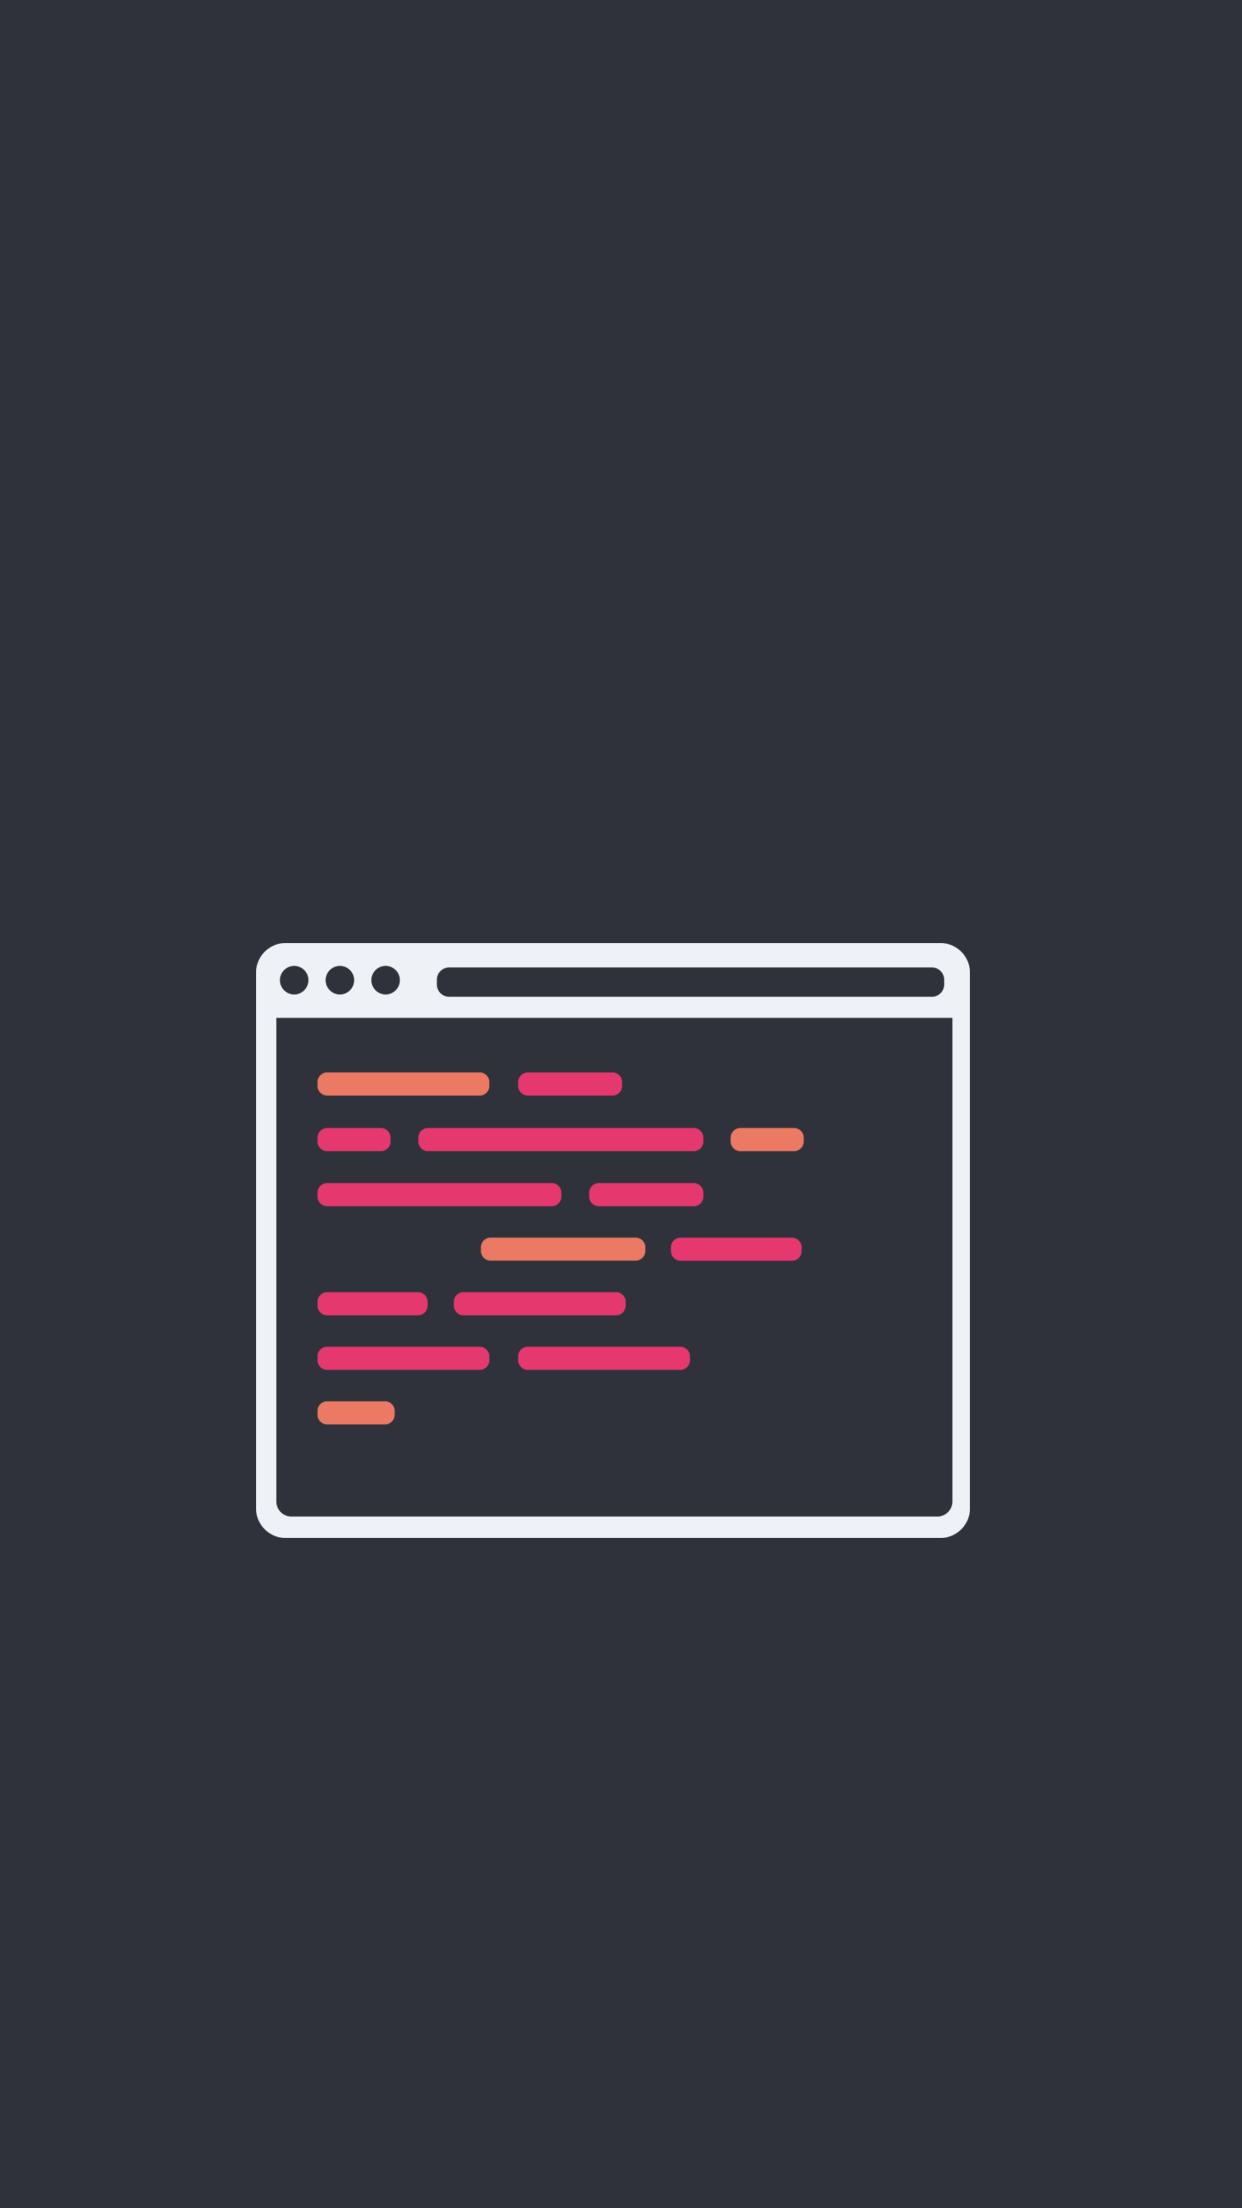 Minimal Iphone Wallpaper Code Iphone Wallpaper Minimal Android Wallpaper Computer Screen Wallpaper